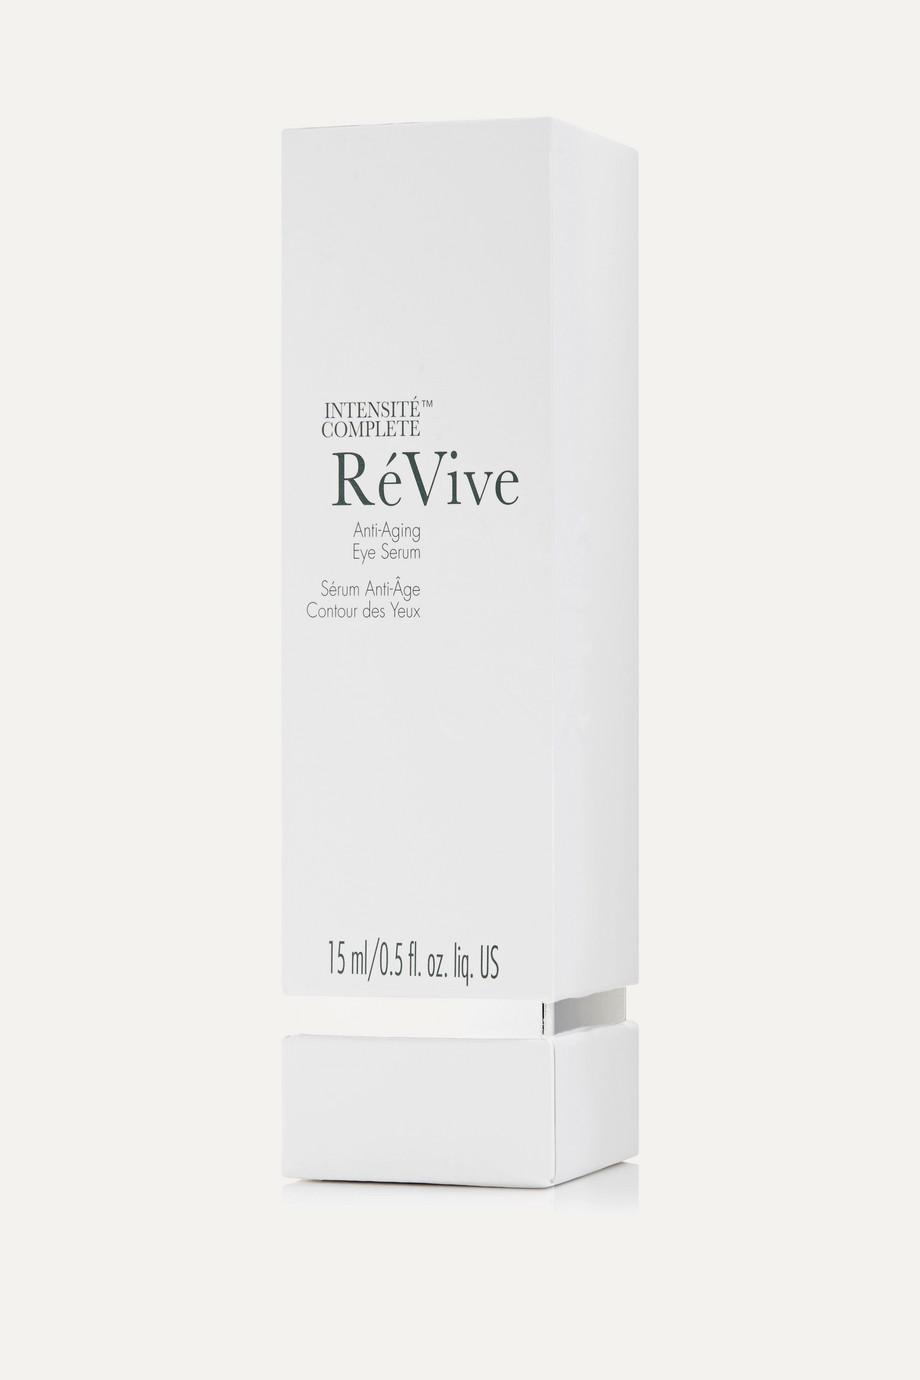 RéVive Intensité Complete Anti-Aging Eye Serum, 15 ml – Augenserum